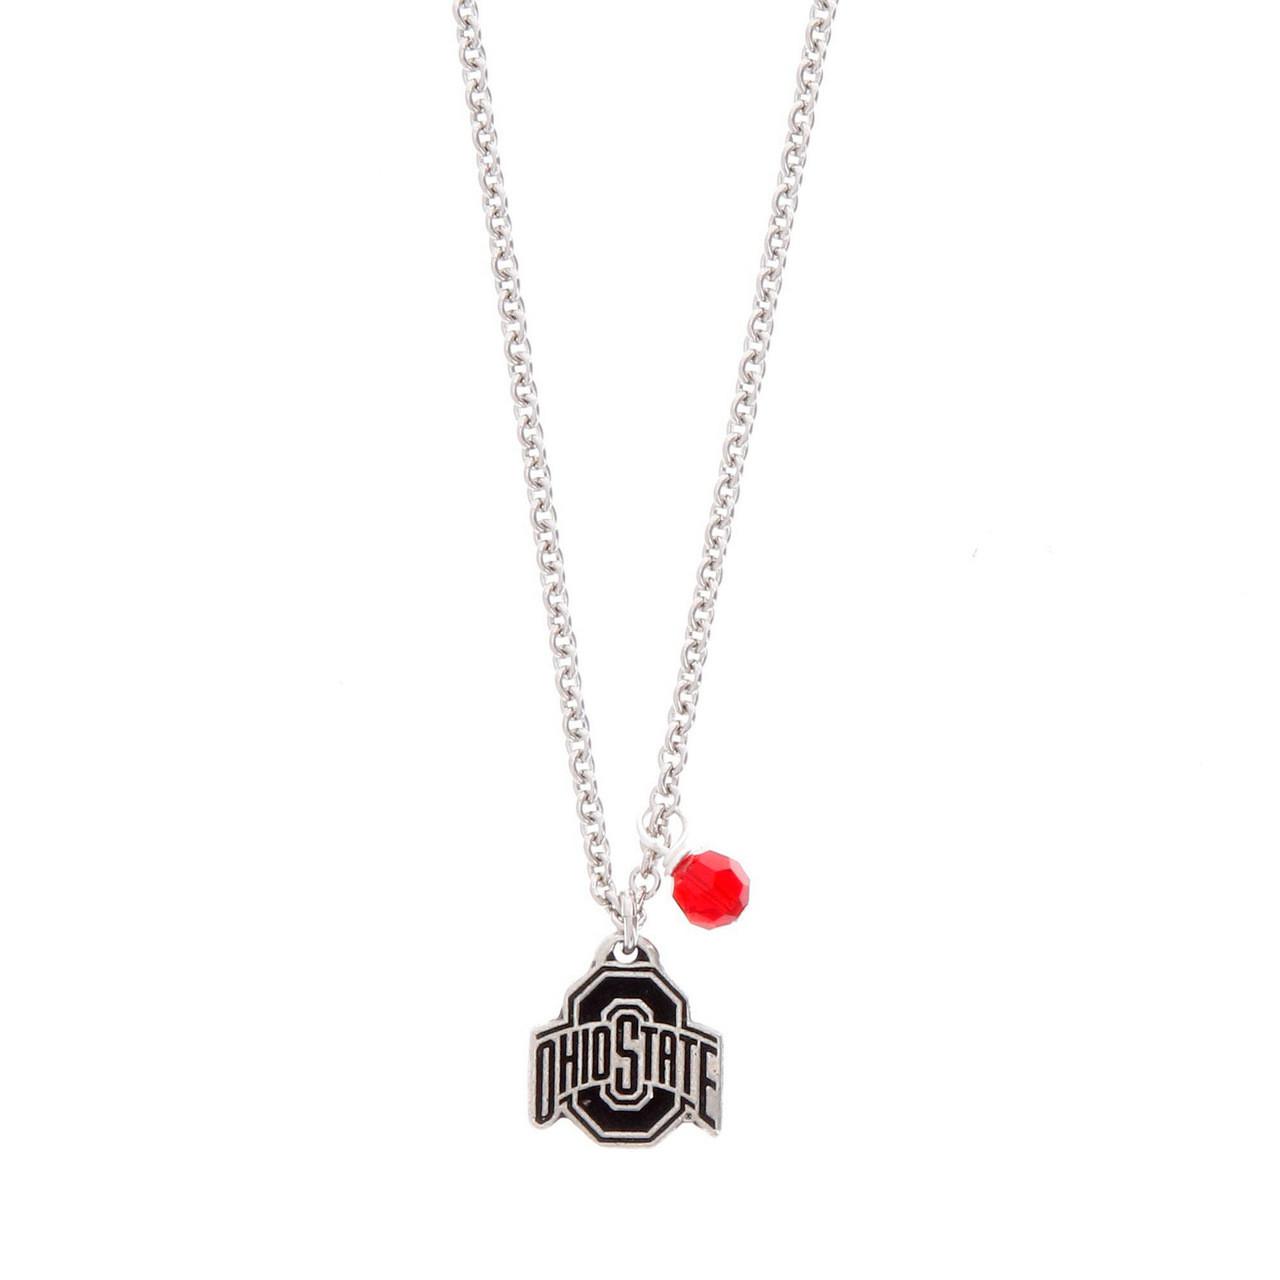 f4f9ecbe5d144 Ohio State Necklace